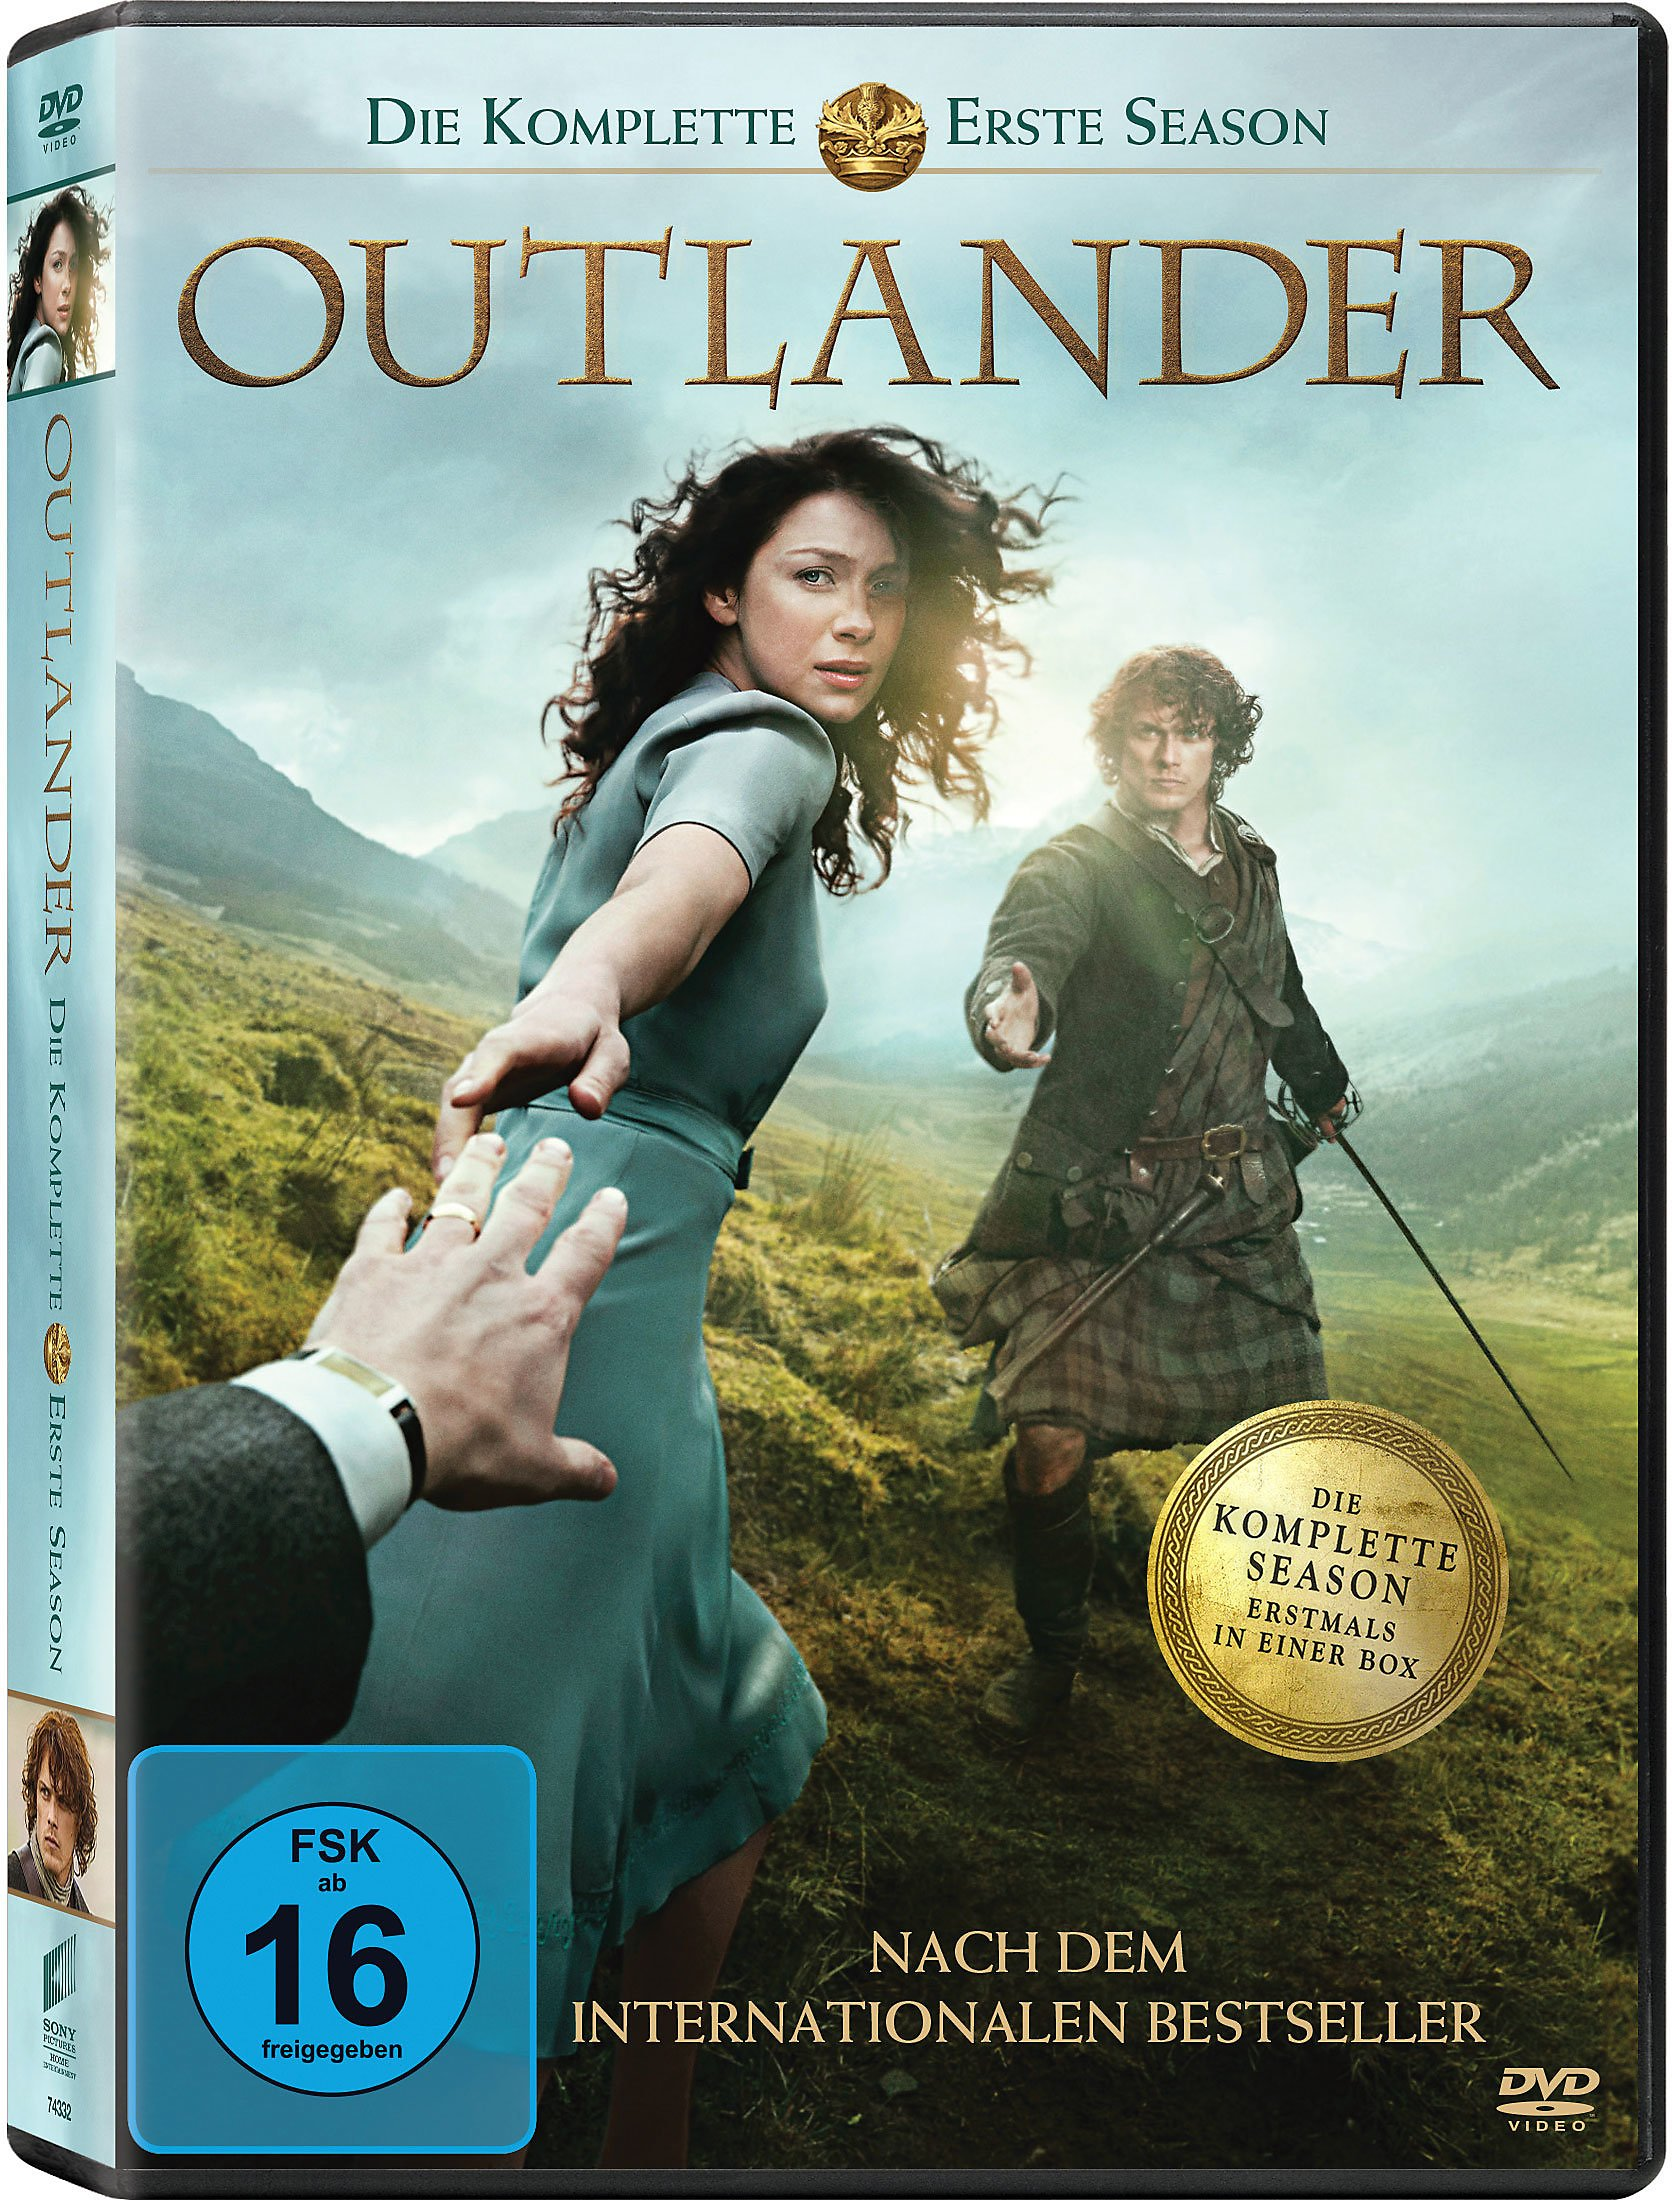 Outlander Staffel 1 Dvd Jetzt Bei Weltbildch Online Bestellen